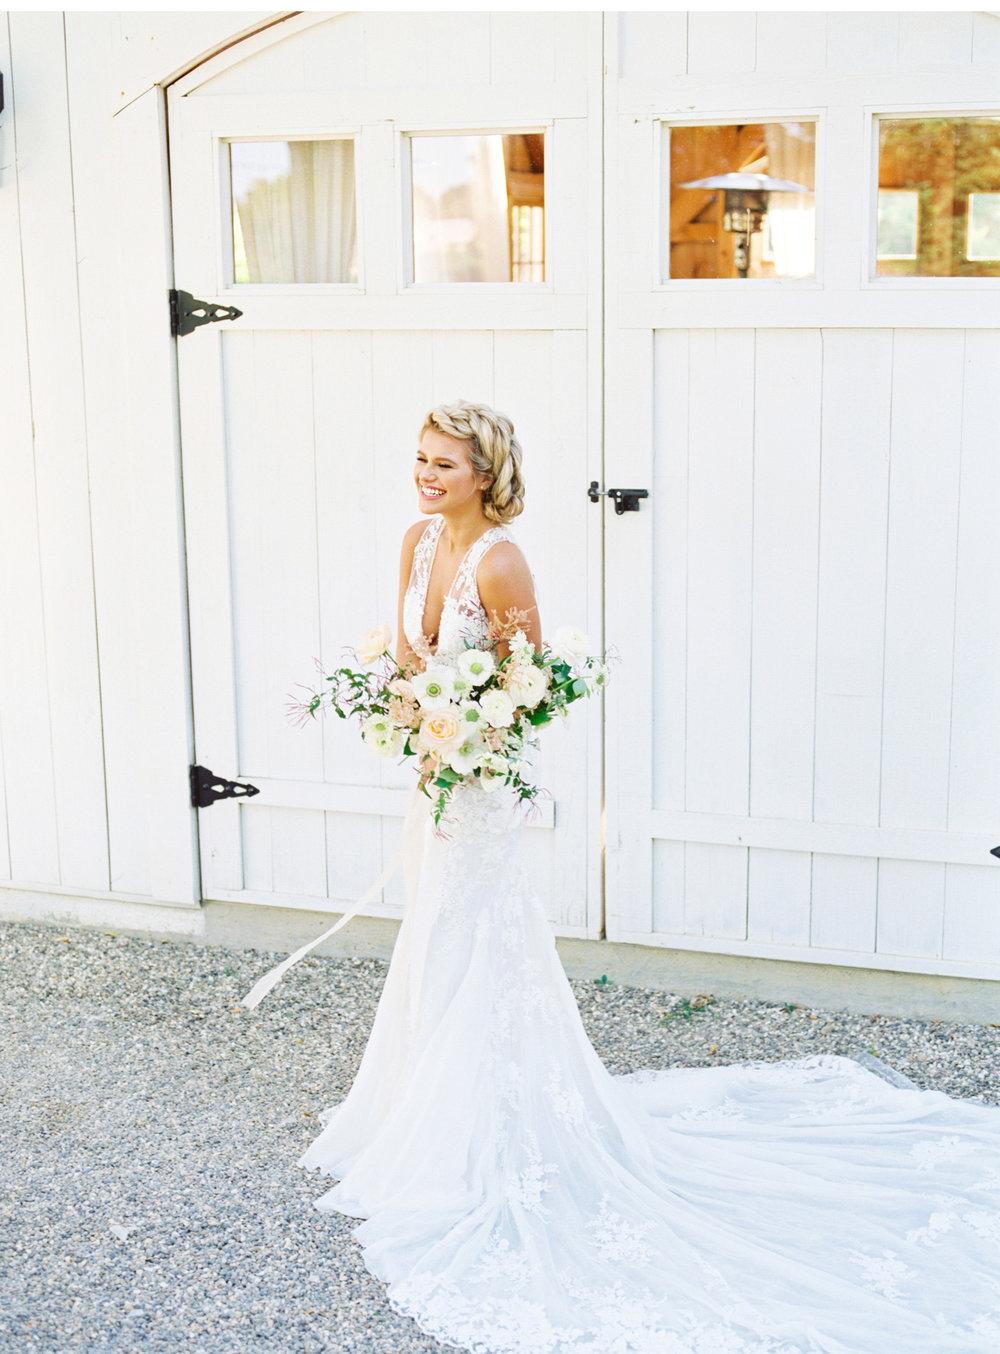 San-Luis-Obispo-Weddings-Natalie-Schutt-Wedding-Photography_12.jpg